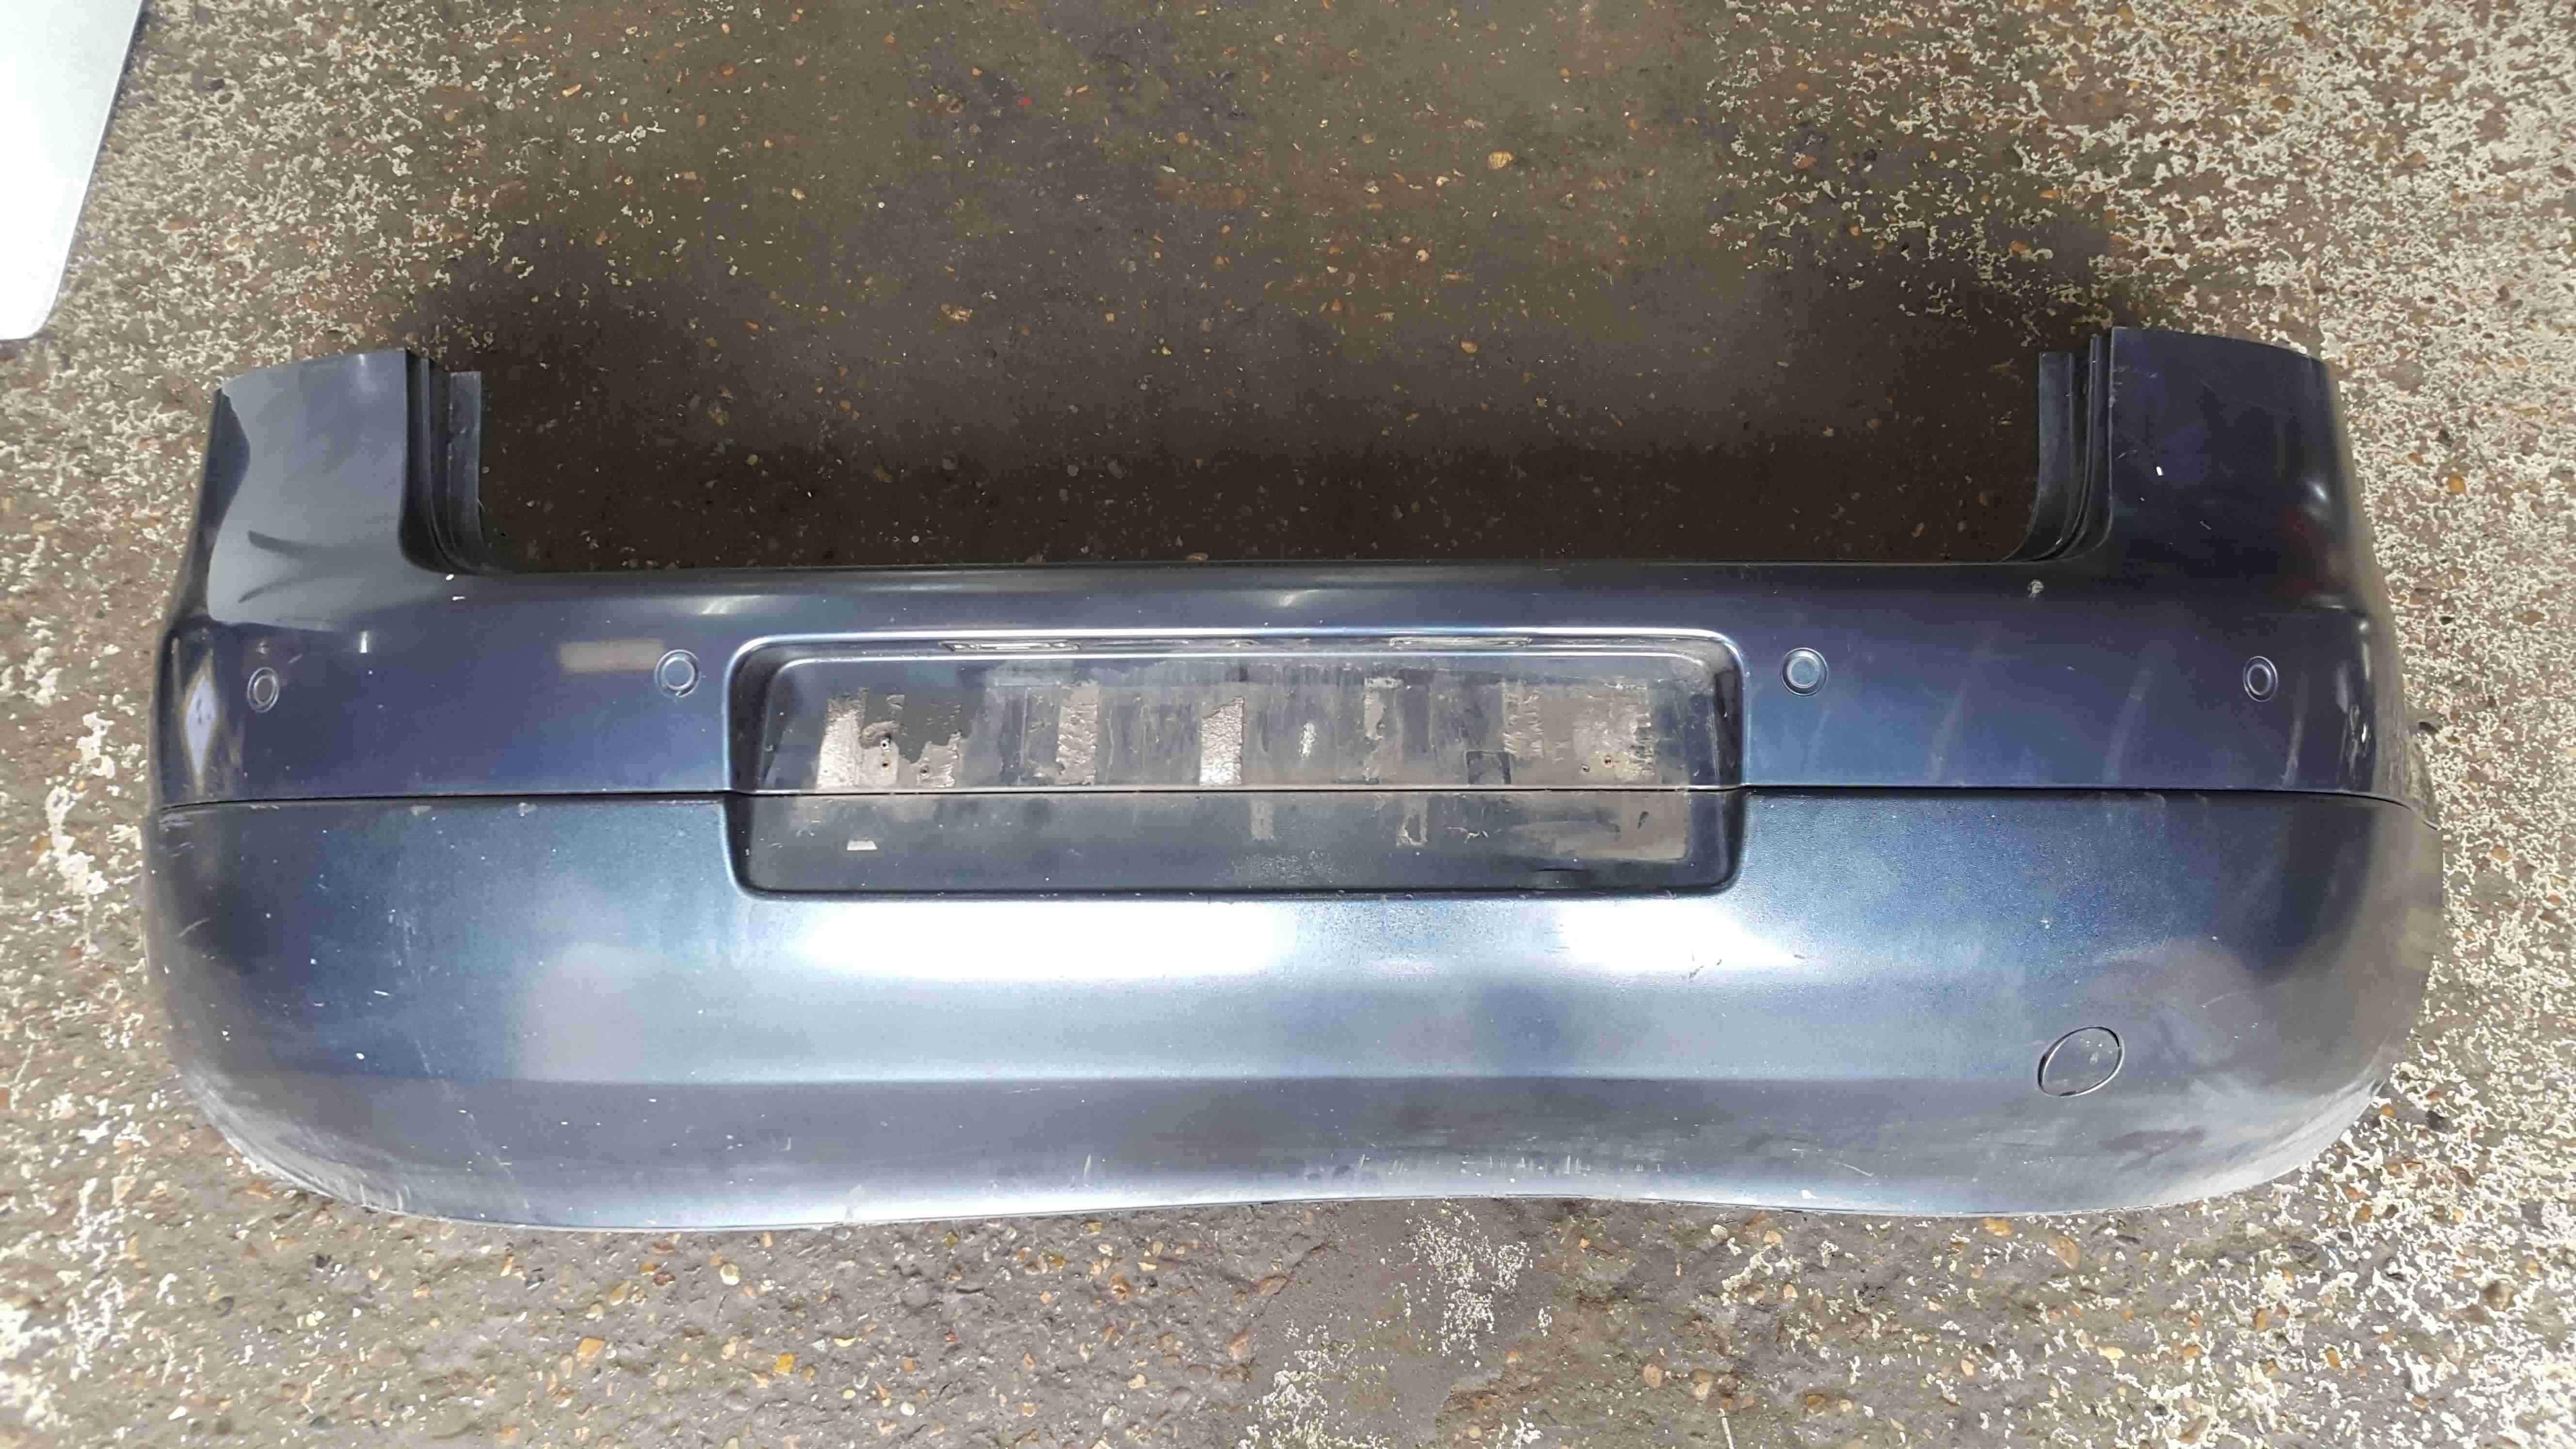 Volkswagen Golf MK5 2003-2009 Rear Bumper Blue Grey LC5F Reversing Sensors